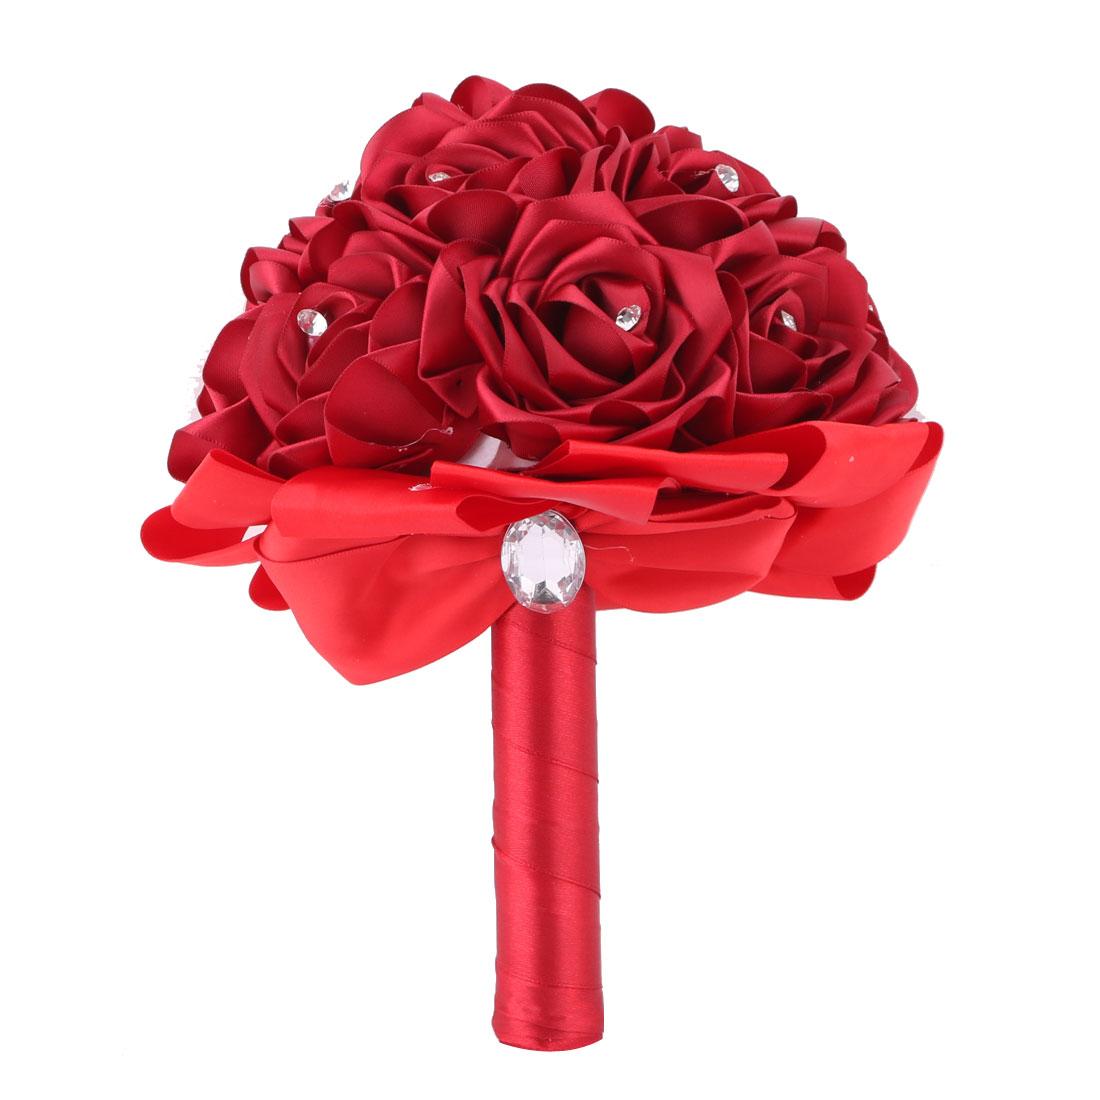 Wedding Party Foam Buds Handhold Roses Bouquet Craft Artificial Flower Decor Dark Red